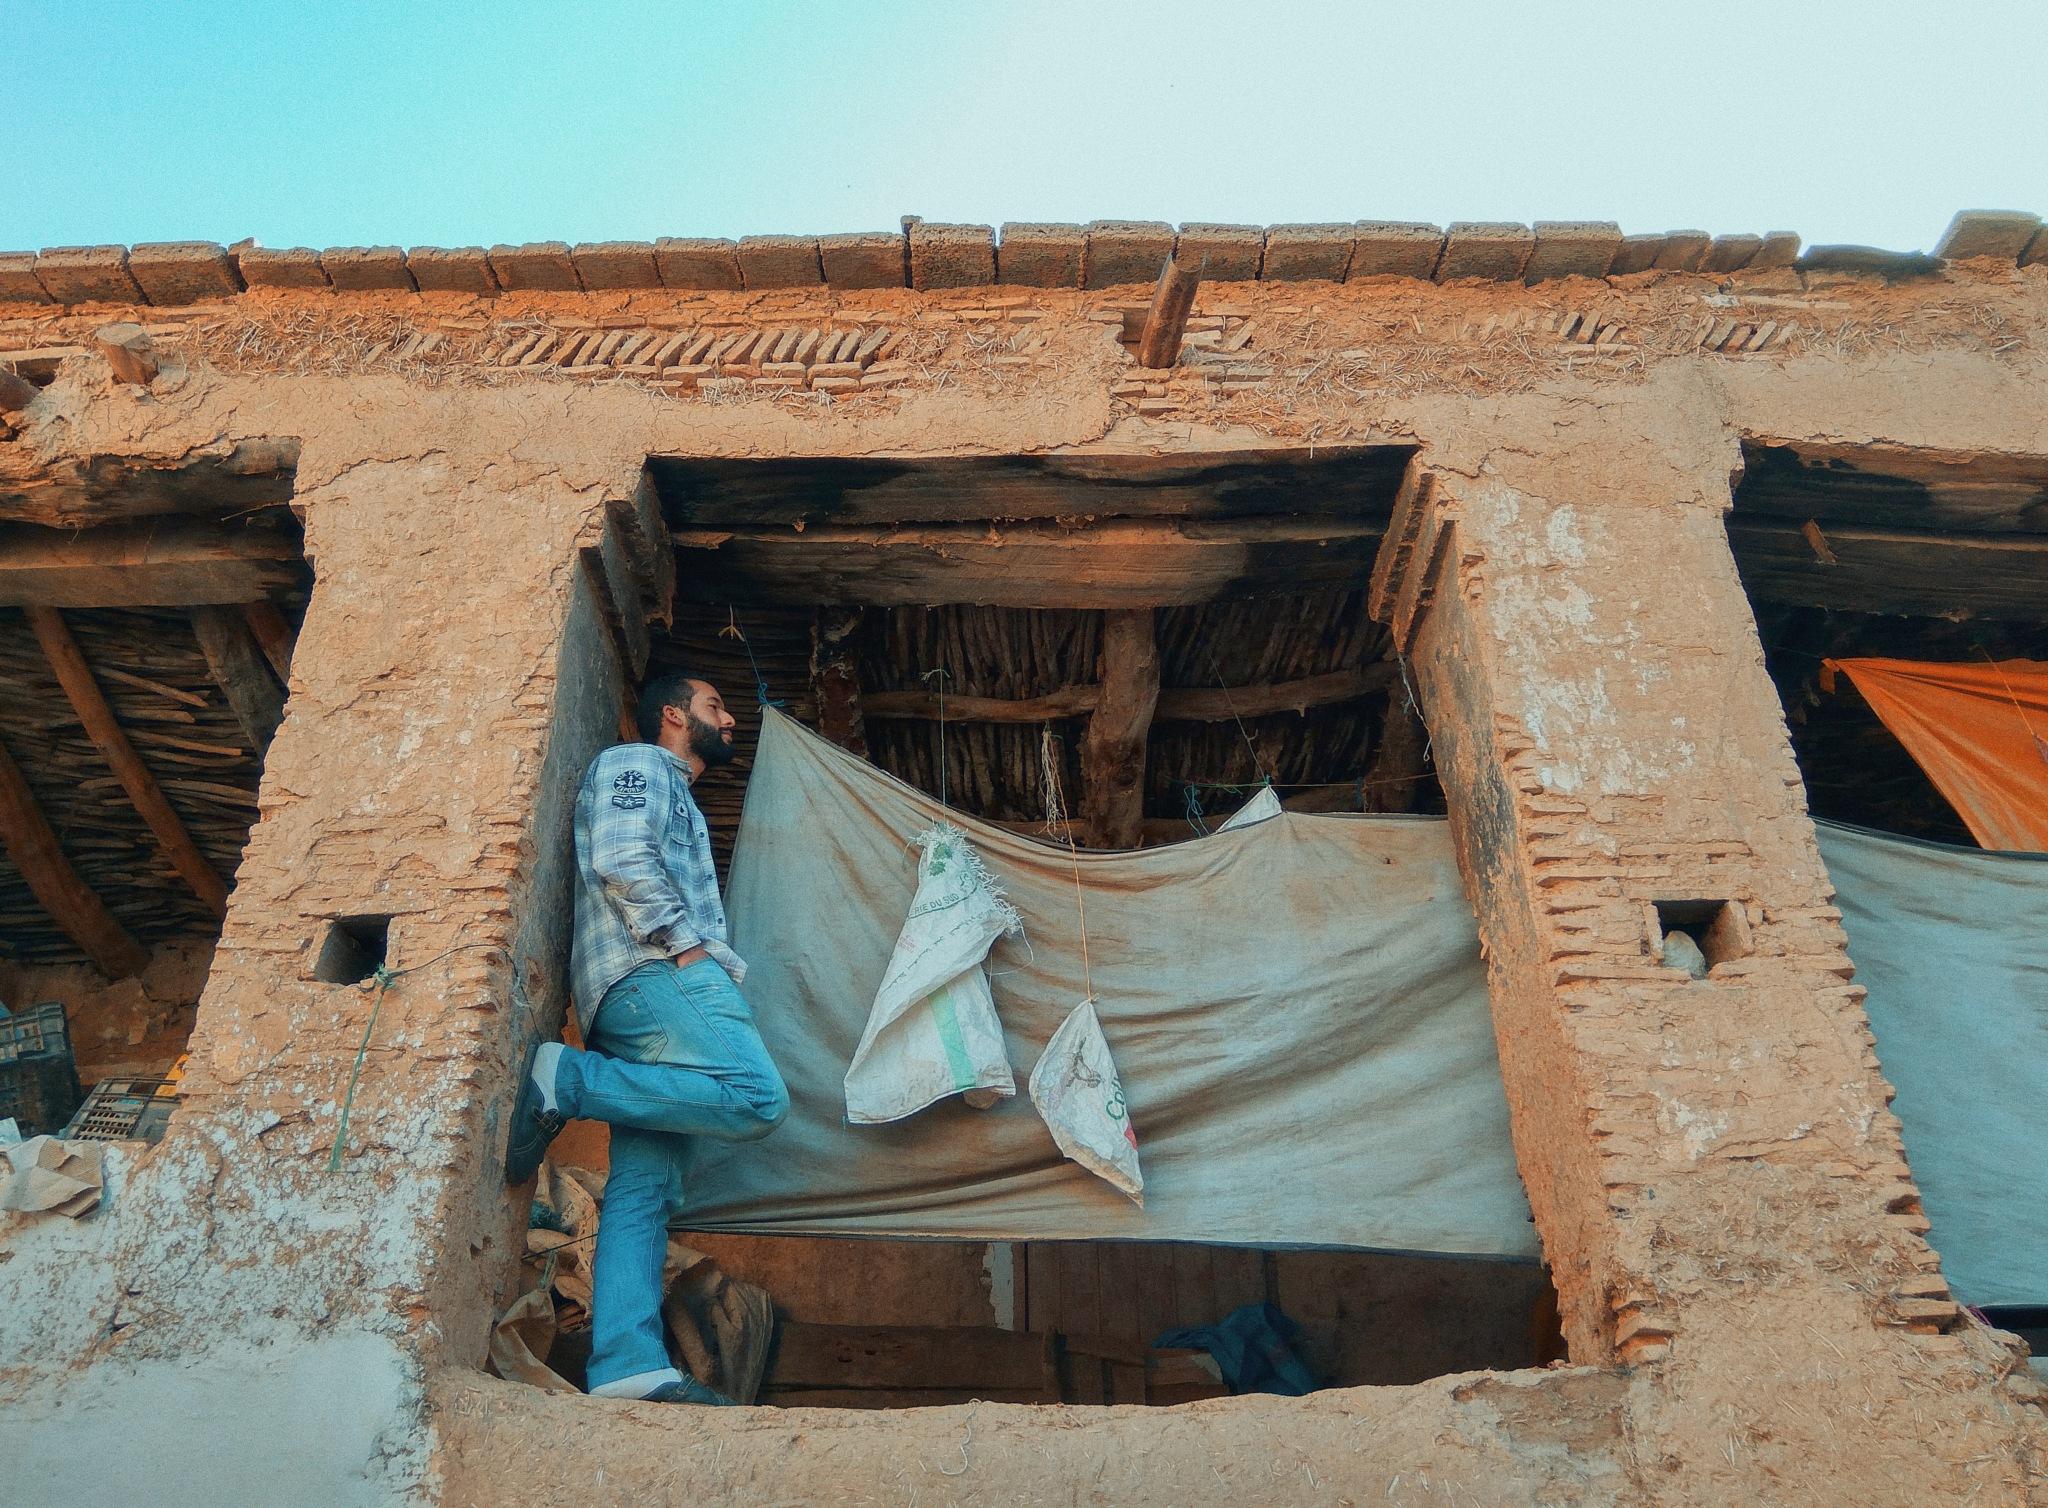 Ftouh Rahba by Elgoustaf Khalid